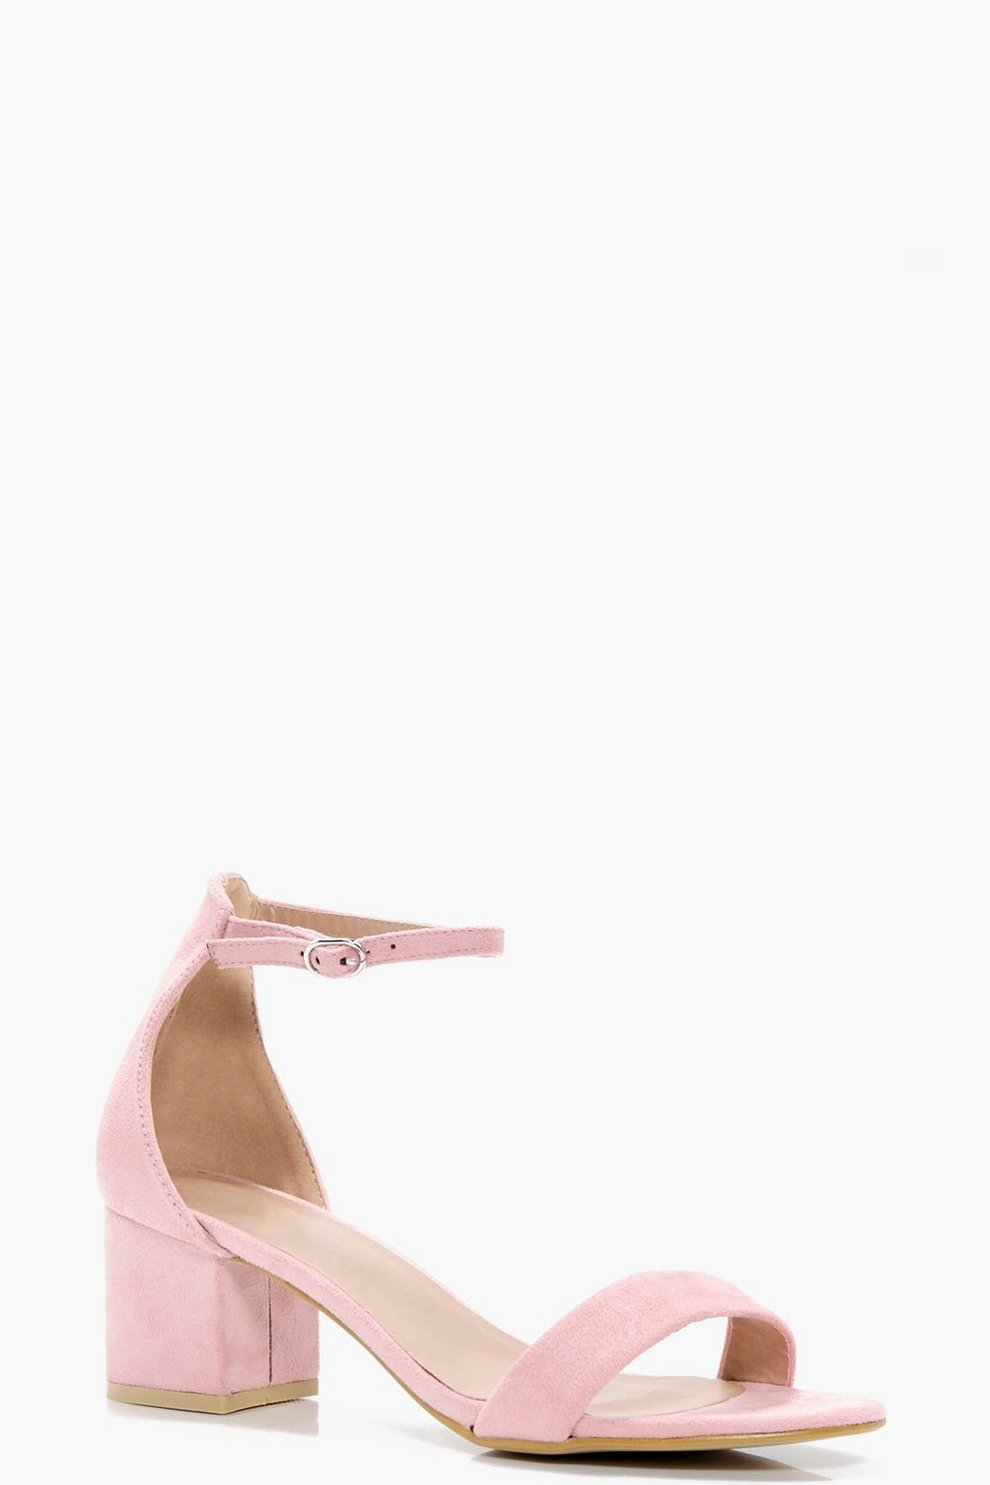 Bethany Low Block Heel pink DZZ45353  VLLNRU09F